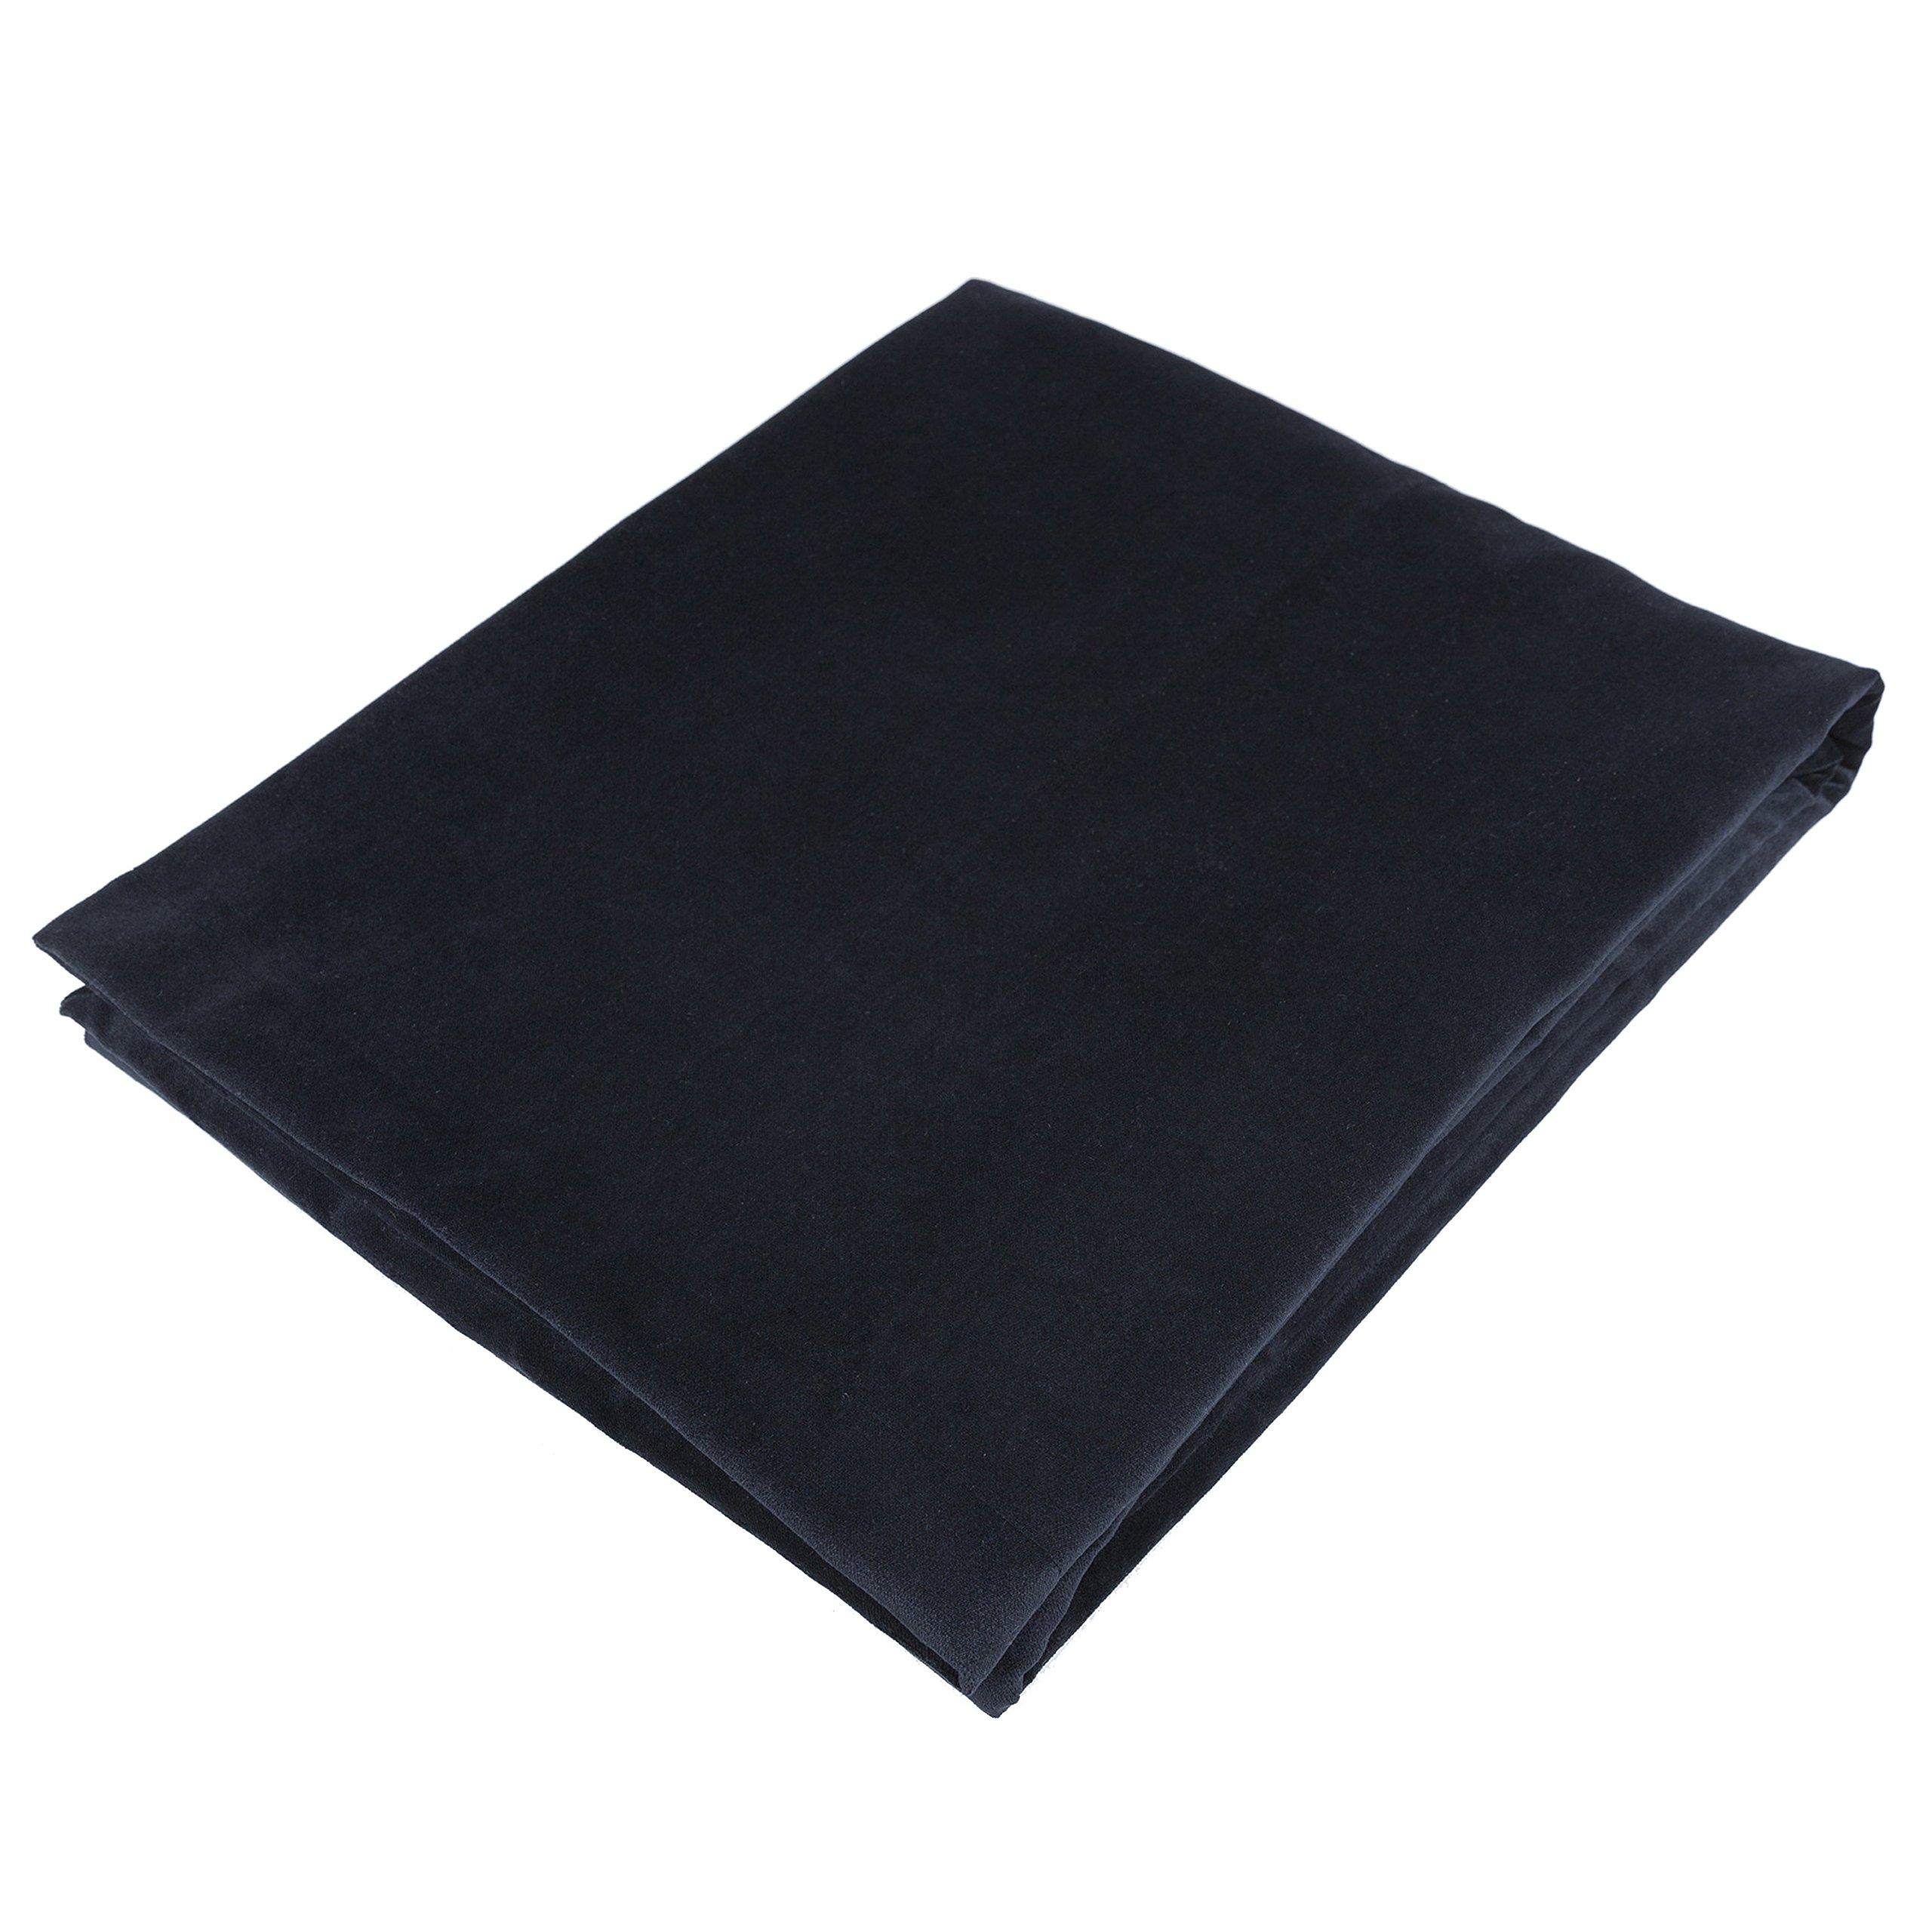 McAlister Matt Velvet | Extra Large Decorative Throw Blanket | 78x100'' Jet Black | Lush, Plush & Soft Classic Modern Accent Décor